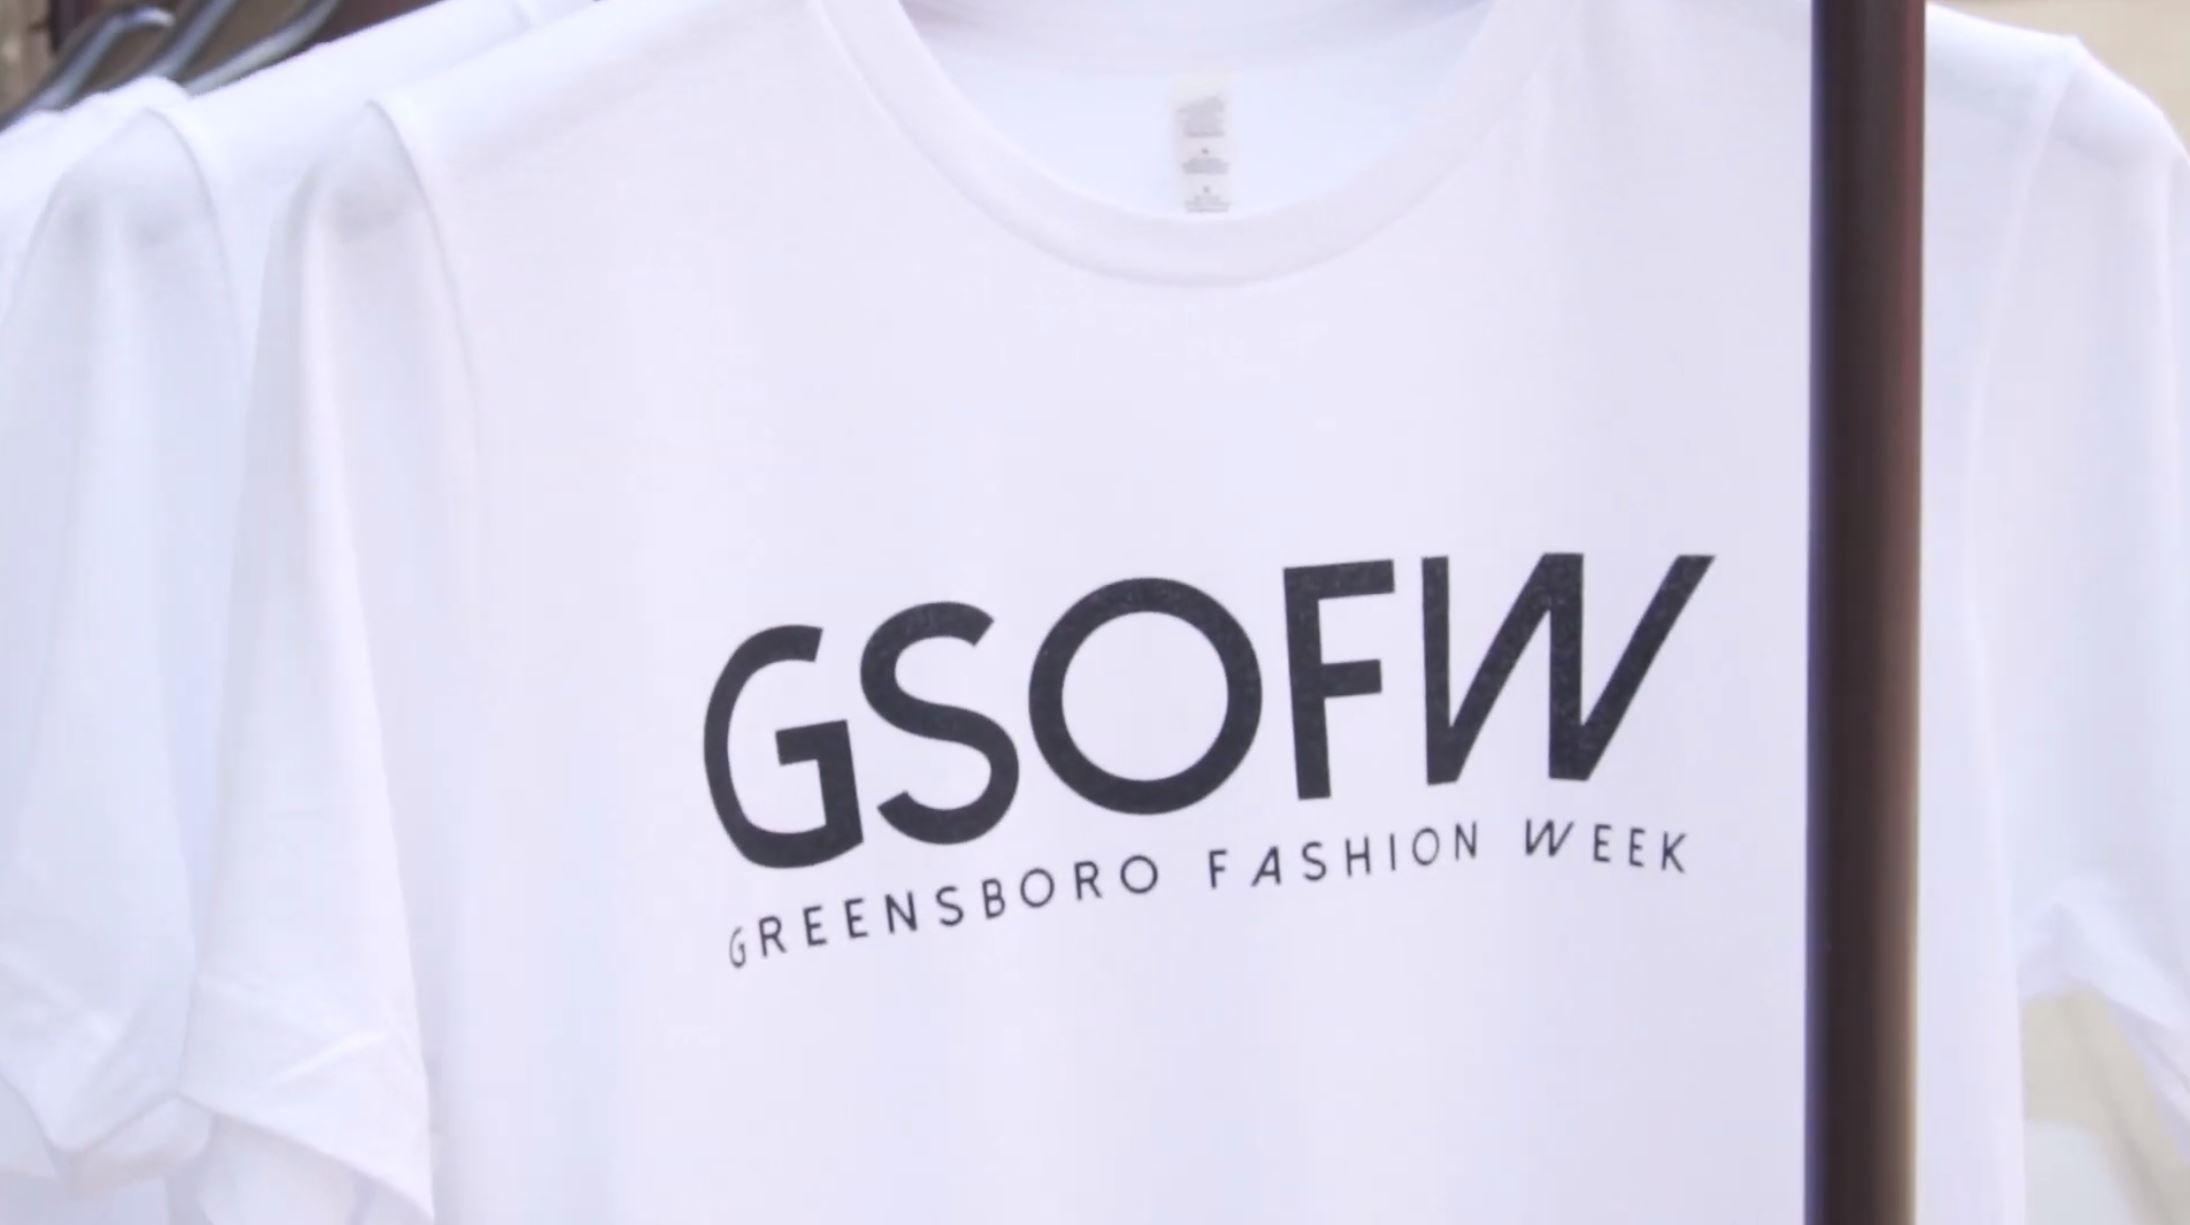 gsofw-image.2.new.jpg